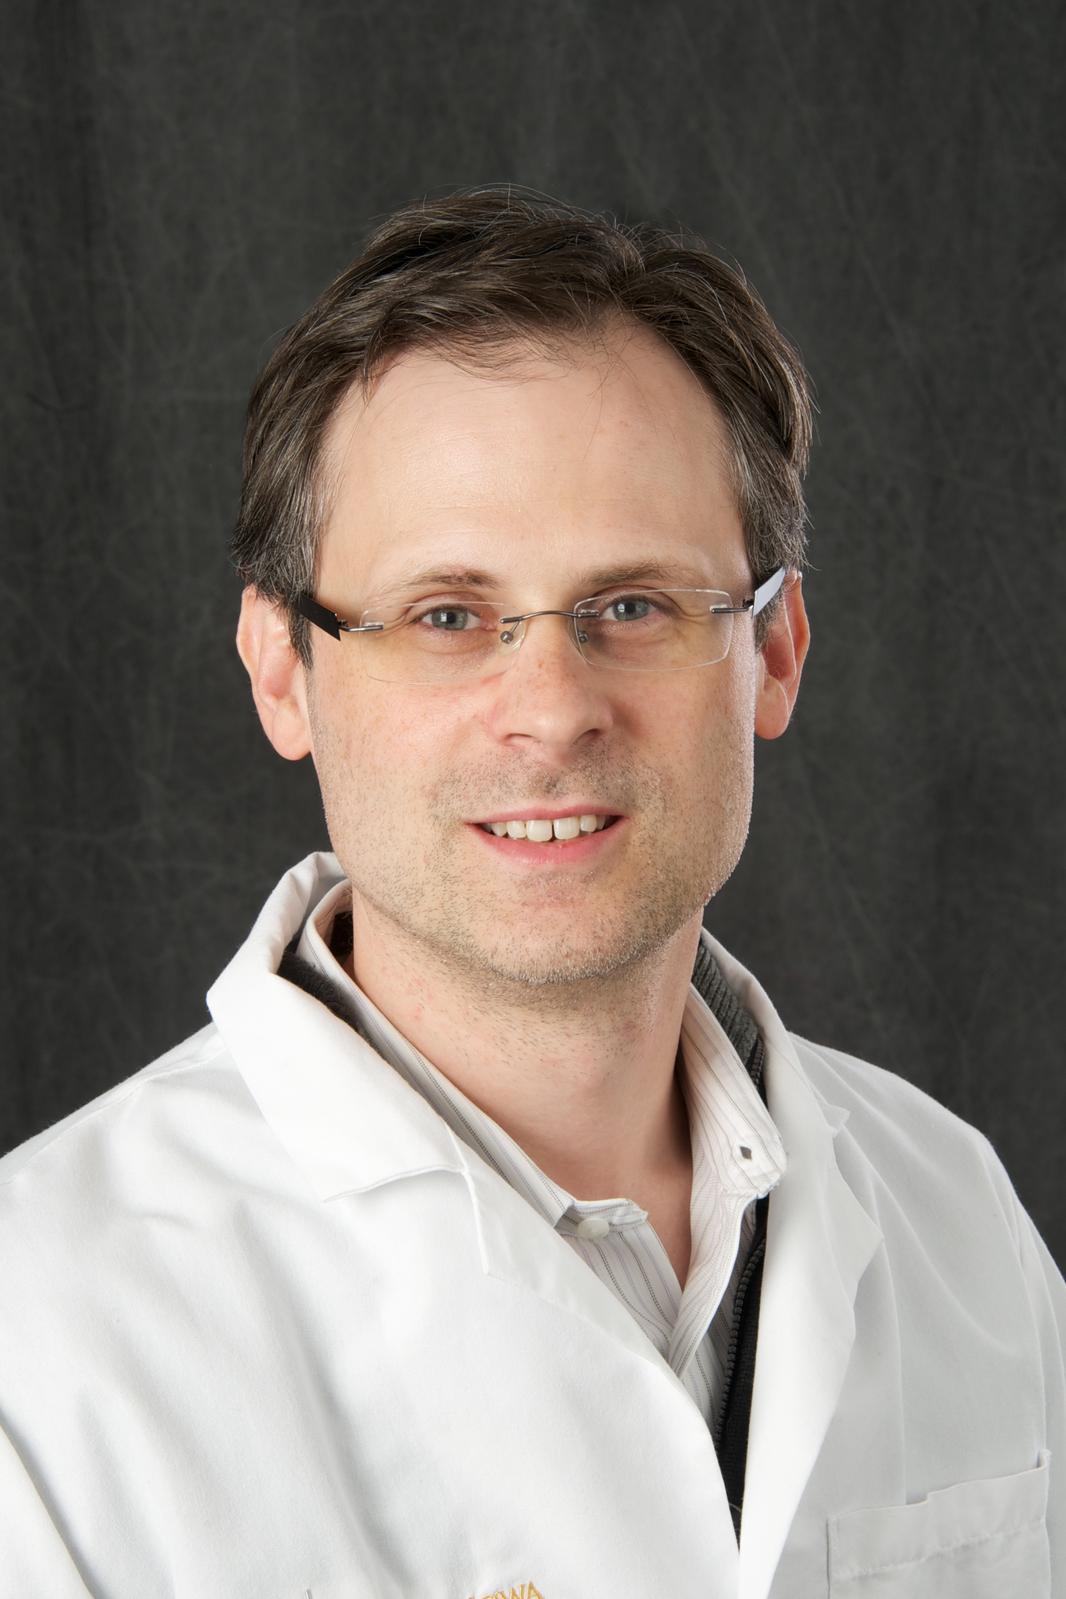 Michael Lutter, MD, PhD